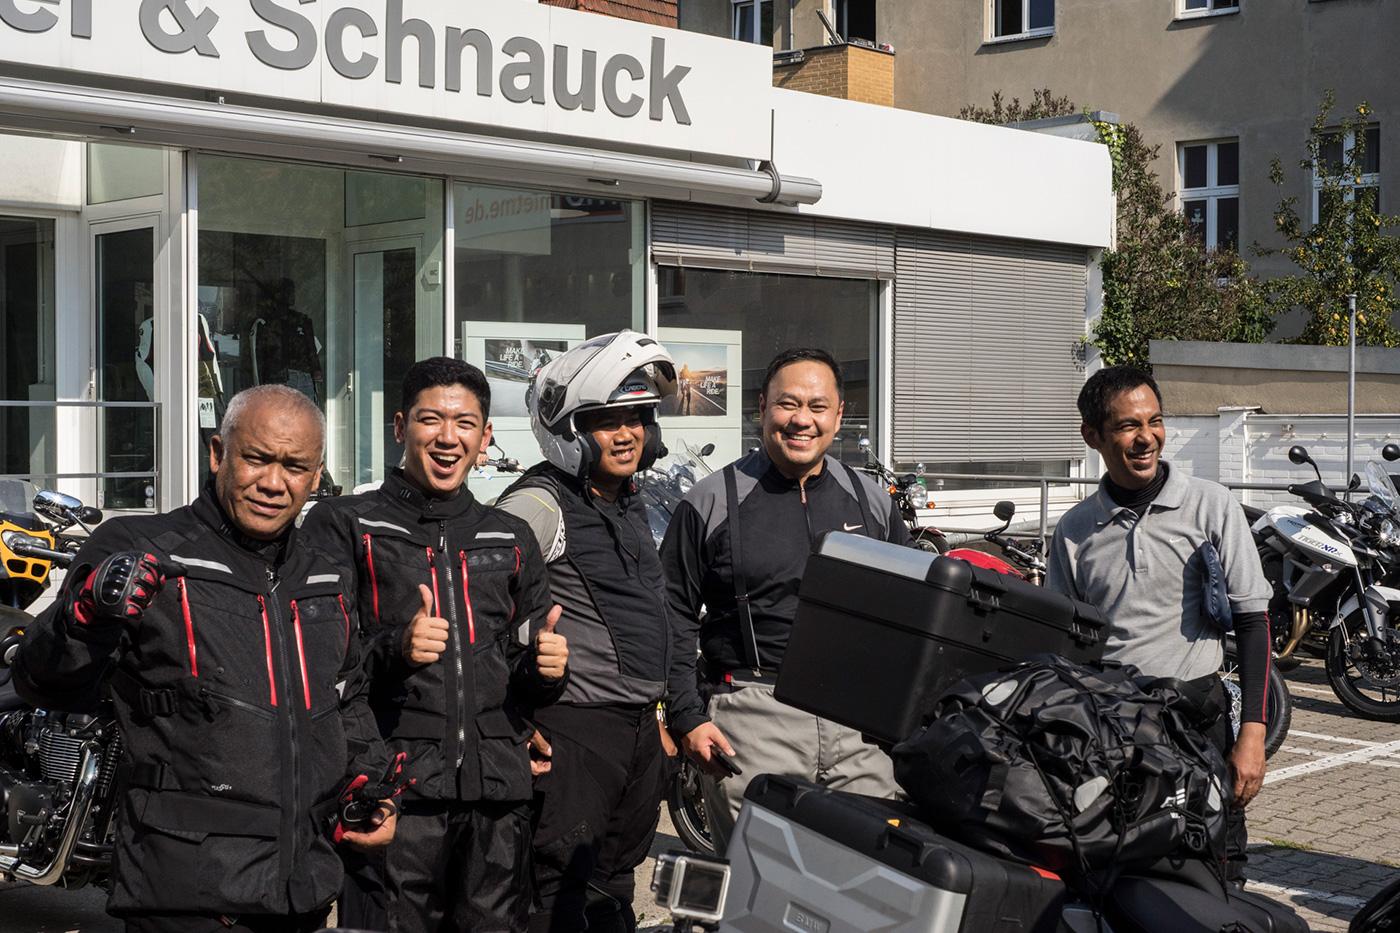 gruppo motociclisti tour leader noleggio